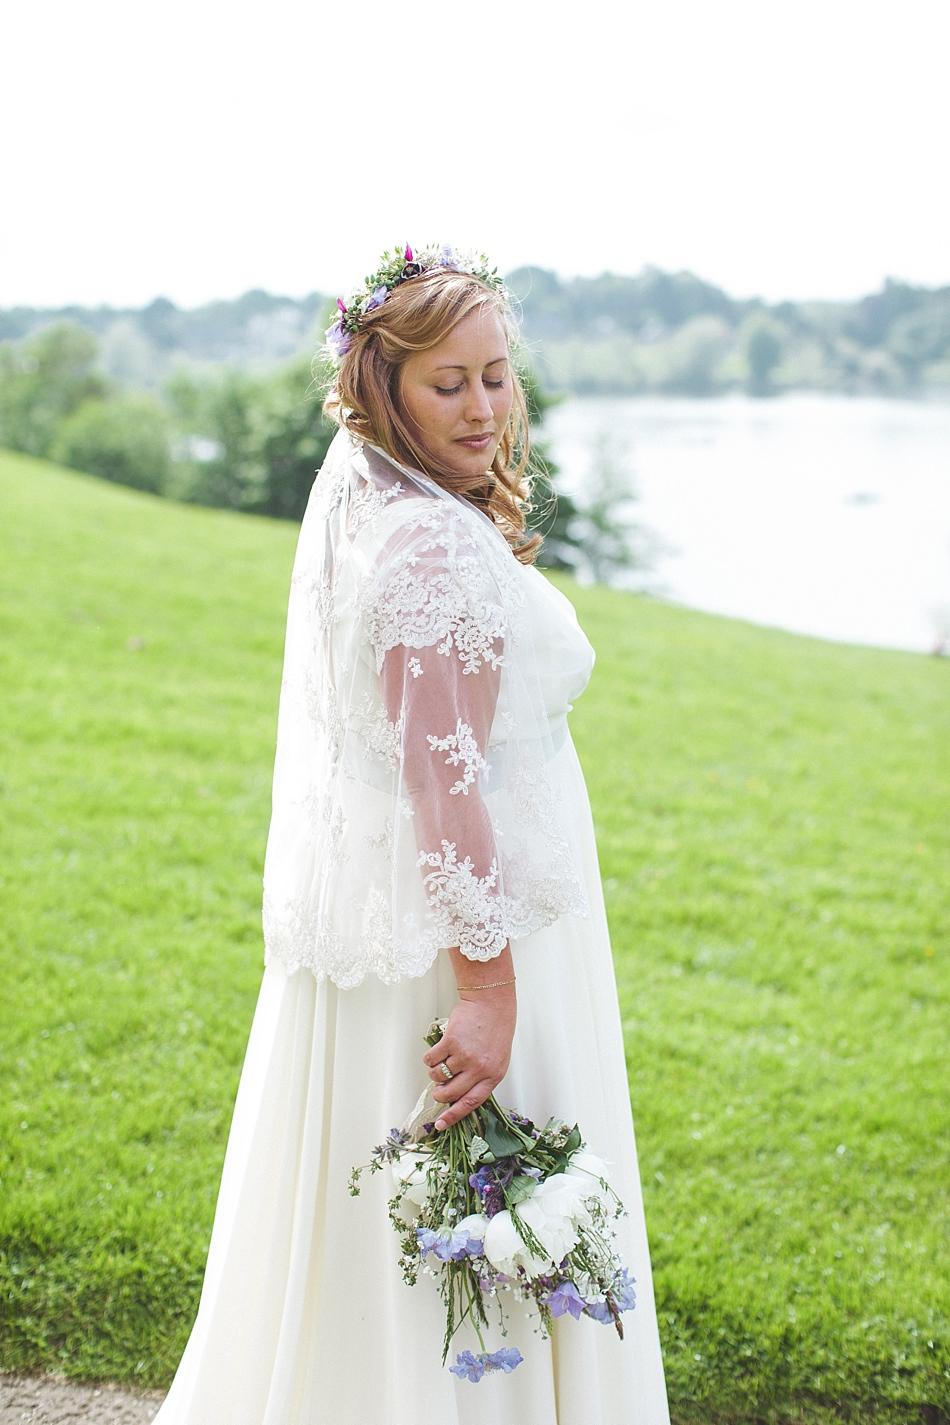 creative wedding photographers scotland 5-1.jpg